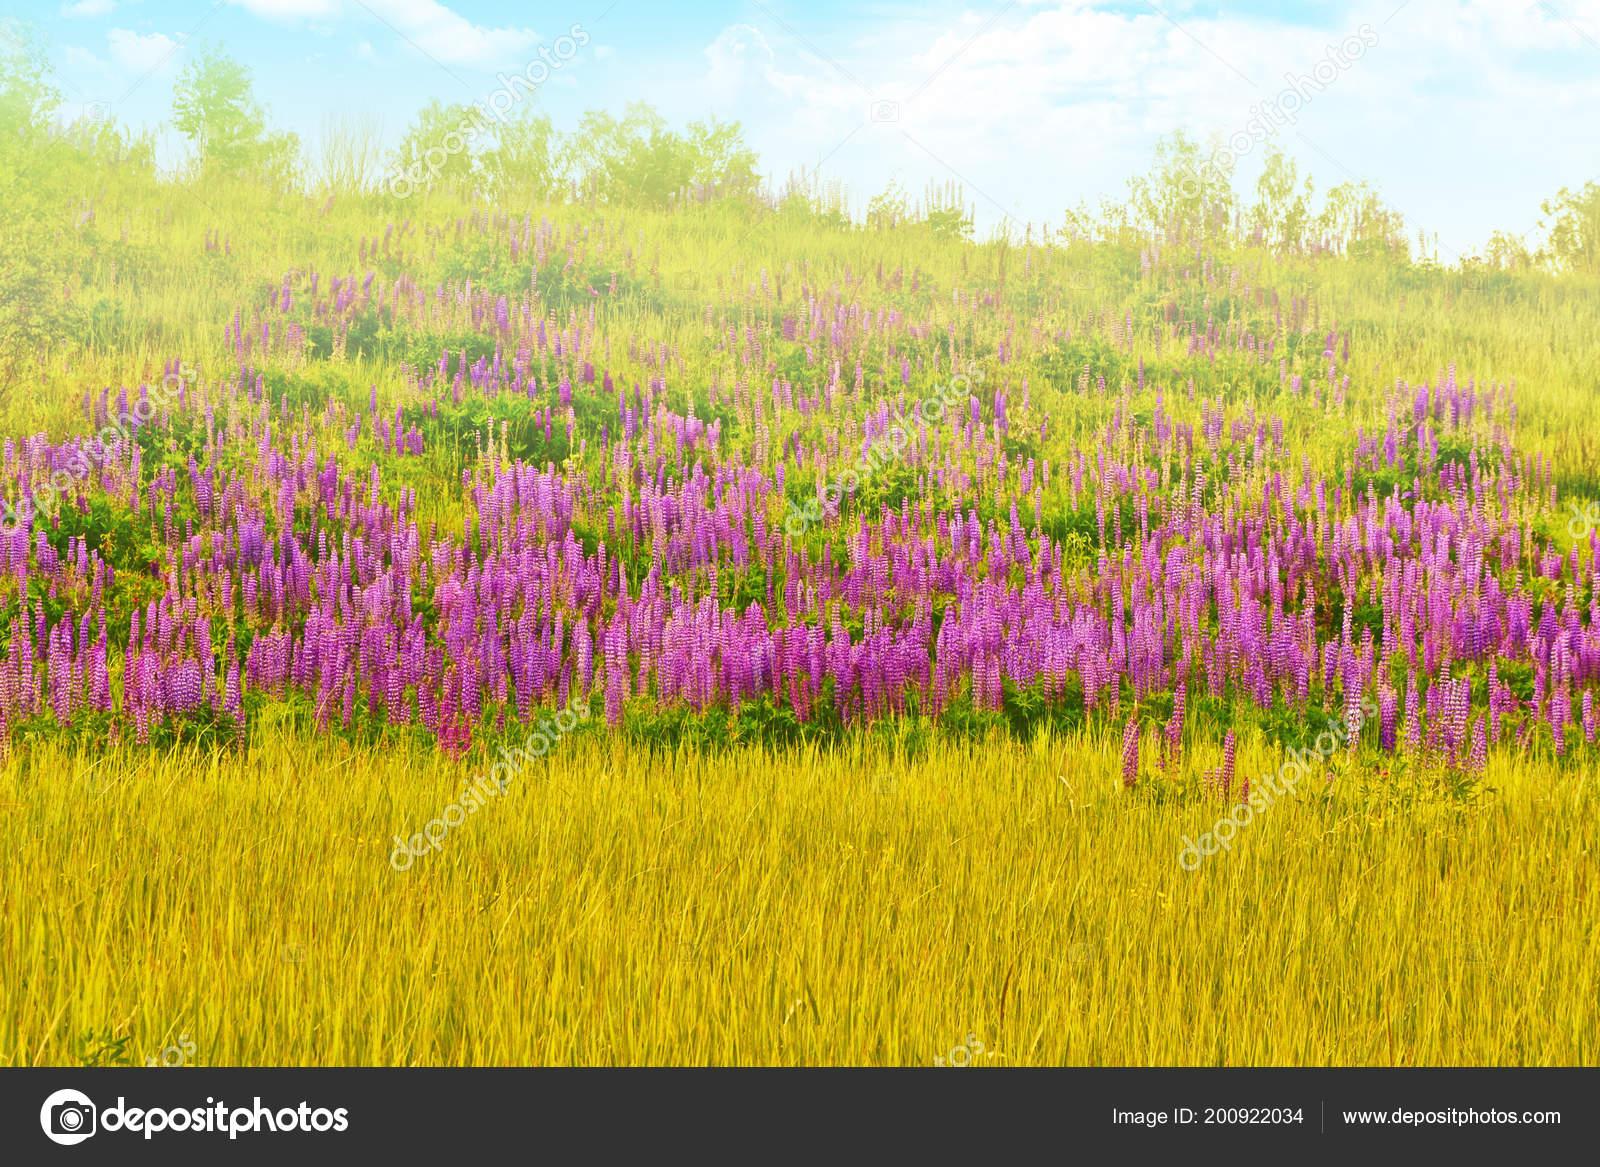 Blurred Natural Floral Background Summer Landscape Beautiful Bright